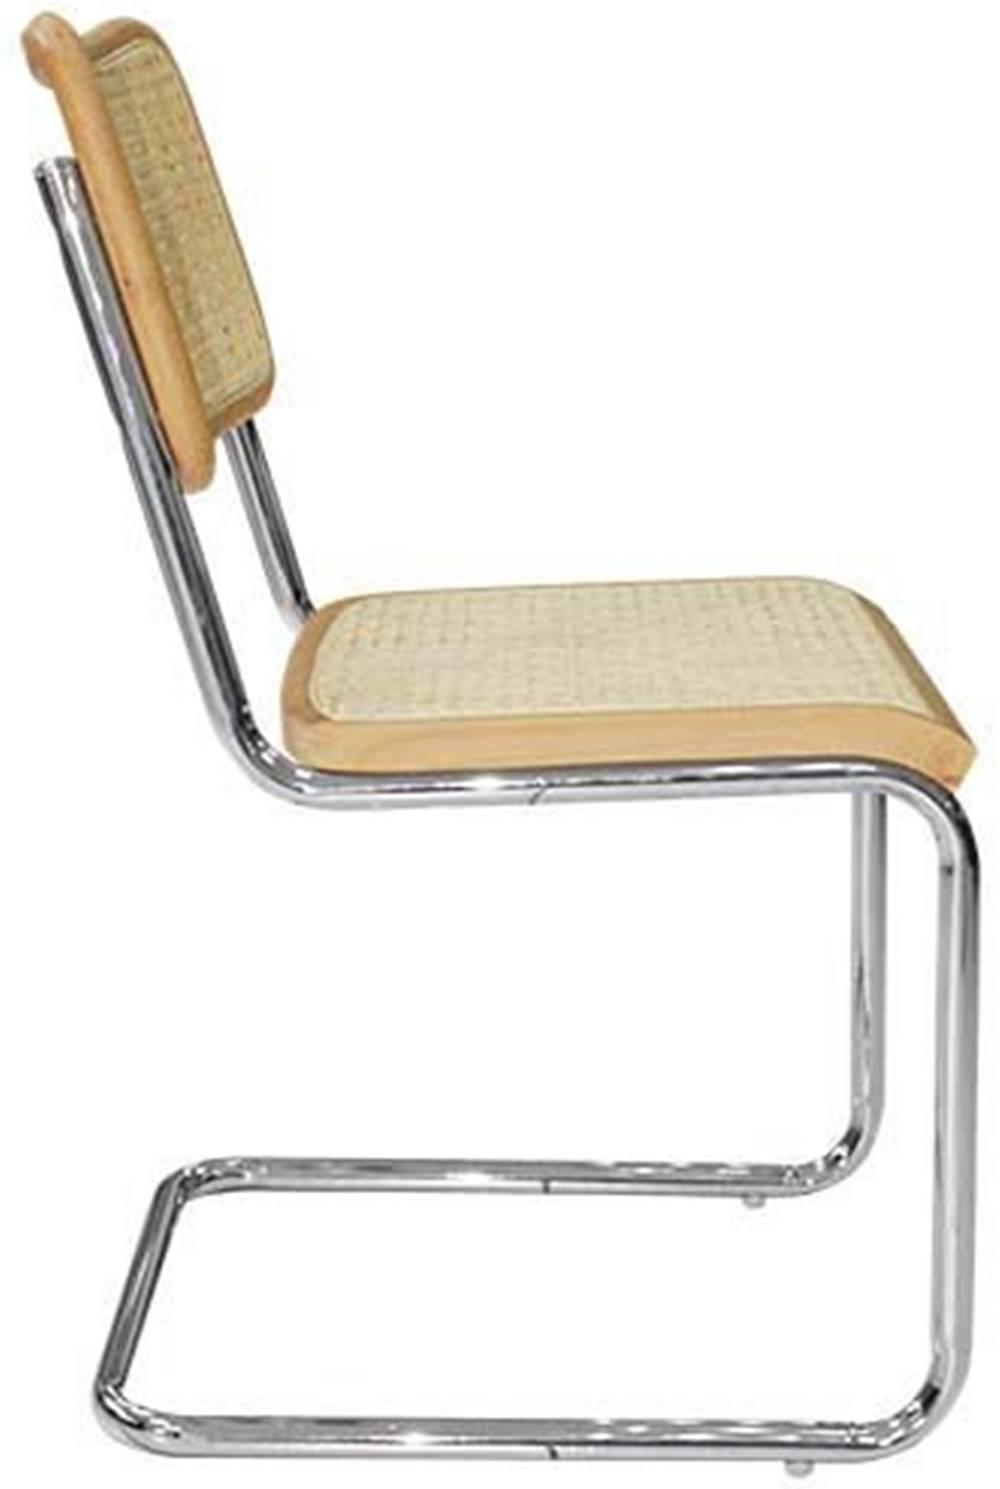 Cadeira Cesca Palha Natural Madeira Clara Cromada - 59417